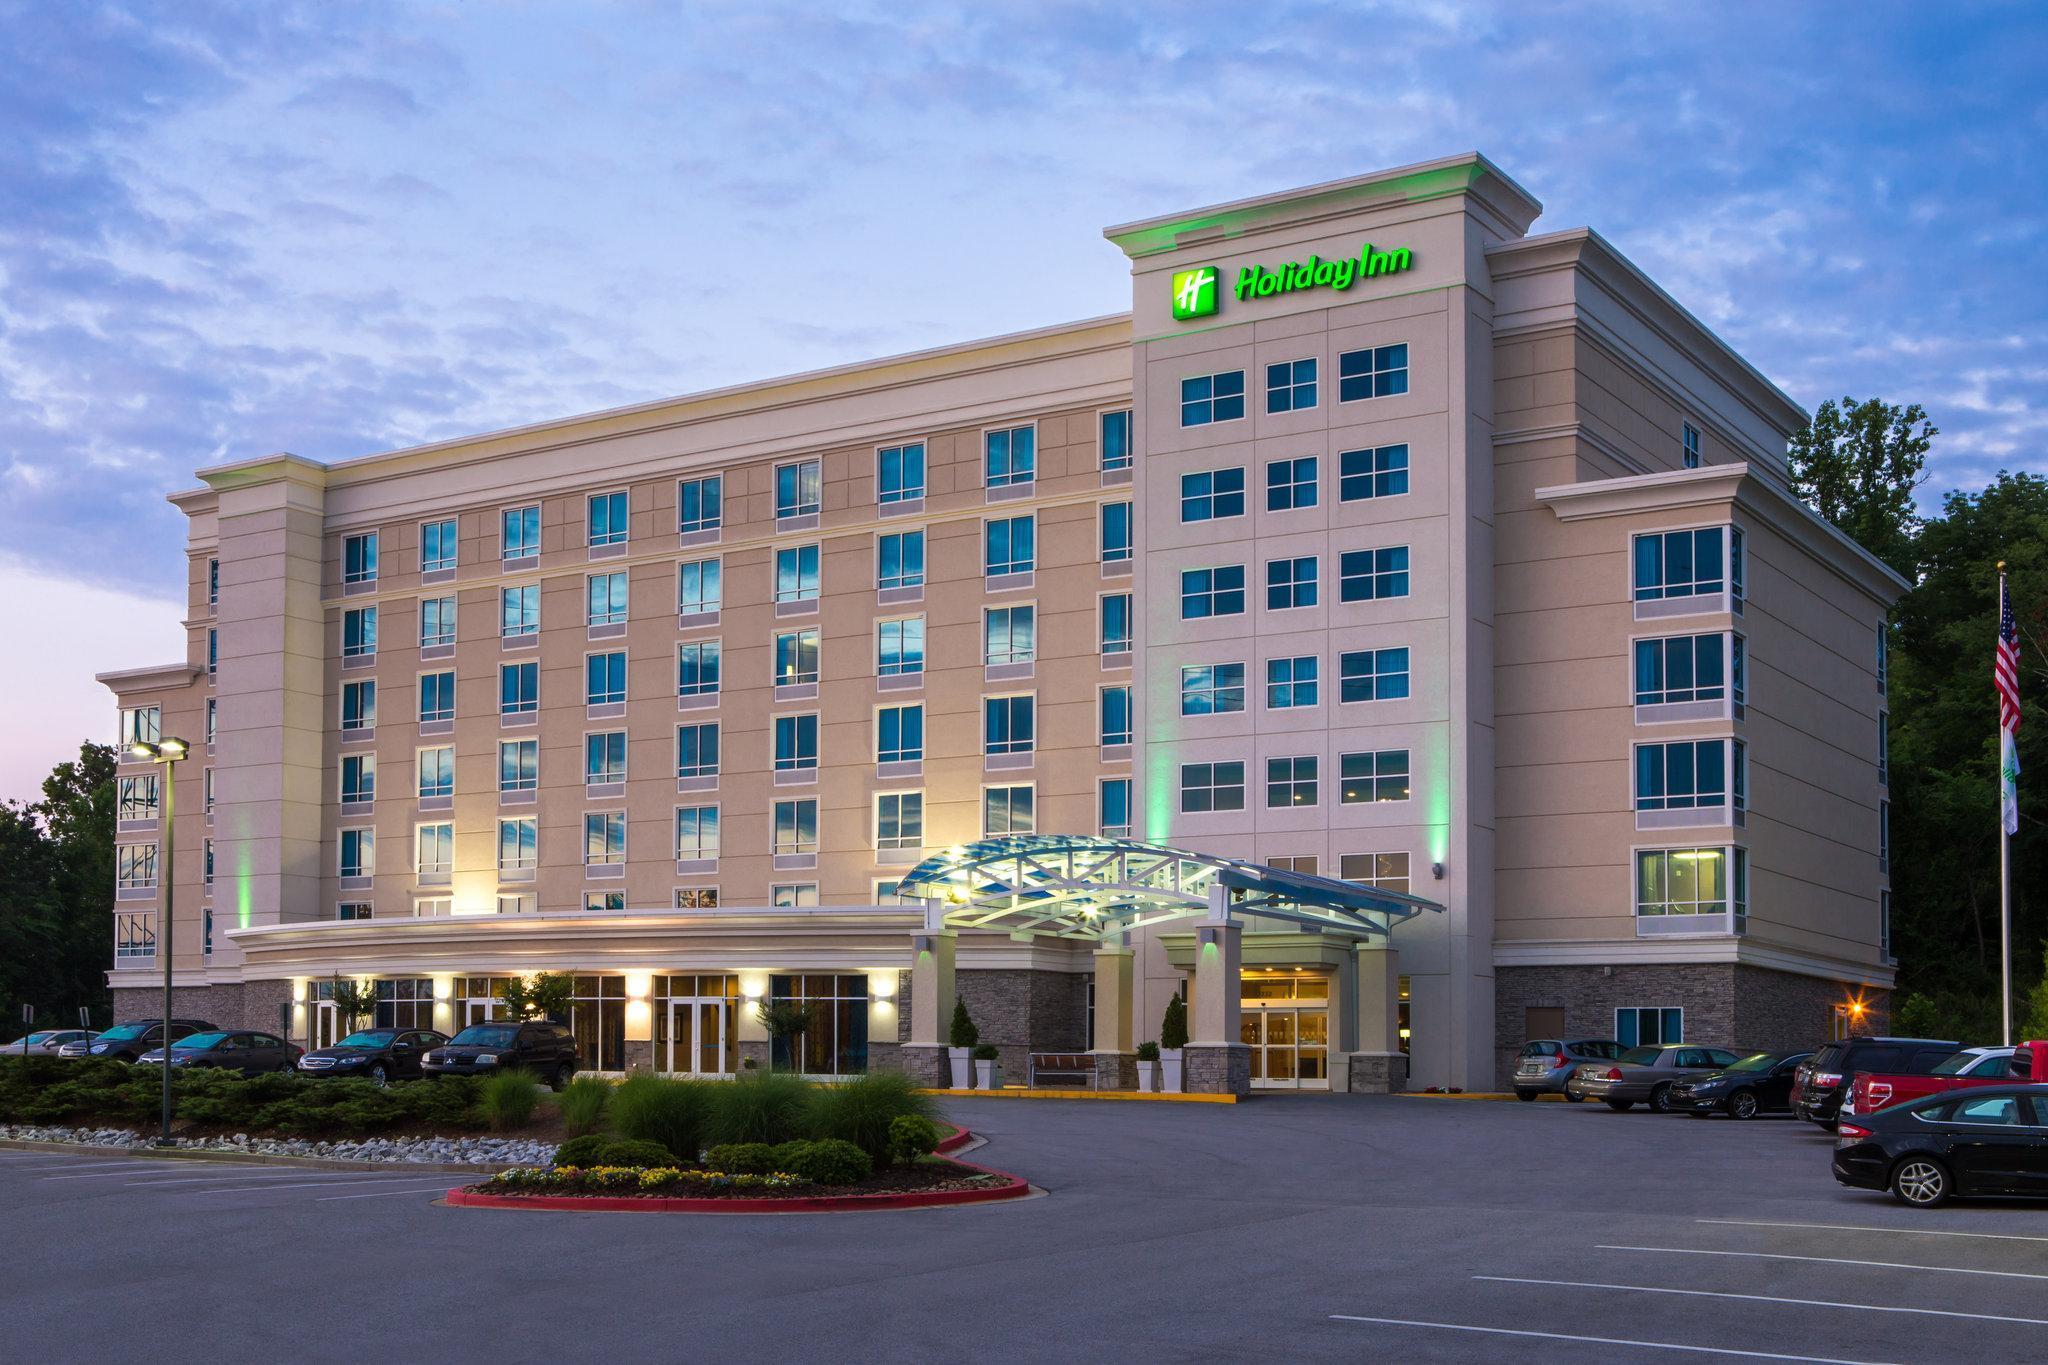 Holiday Inn Chattanooga Hamilton Place